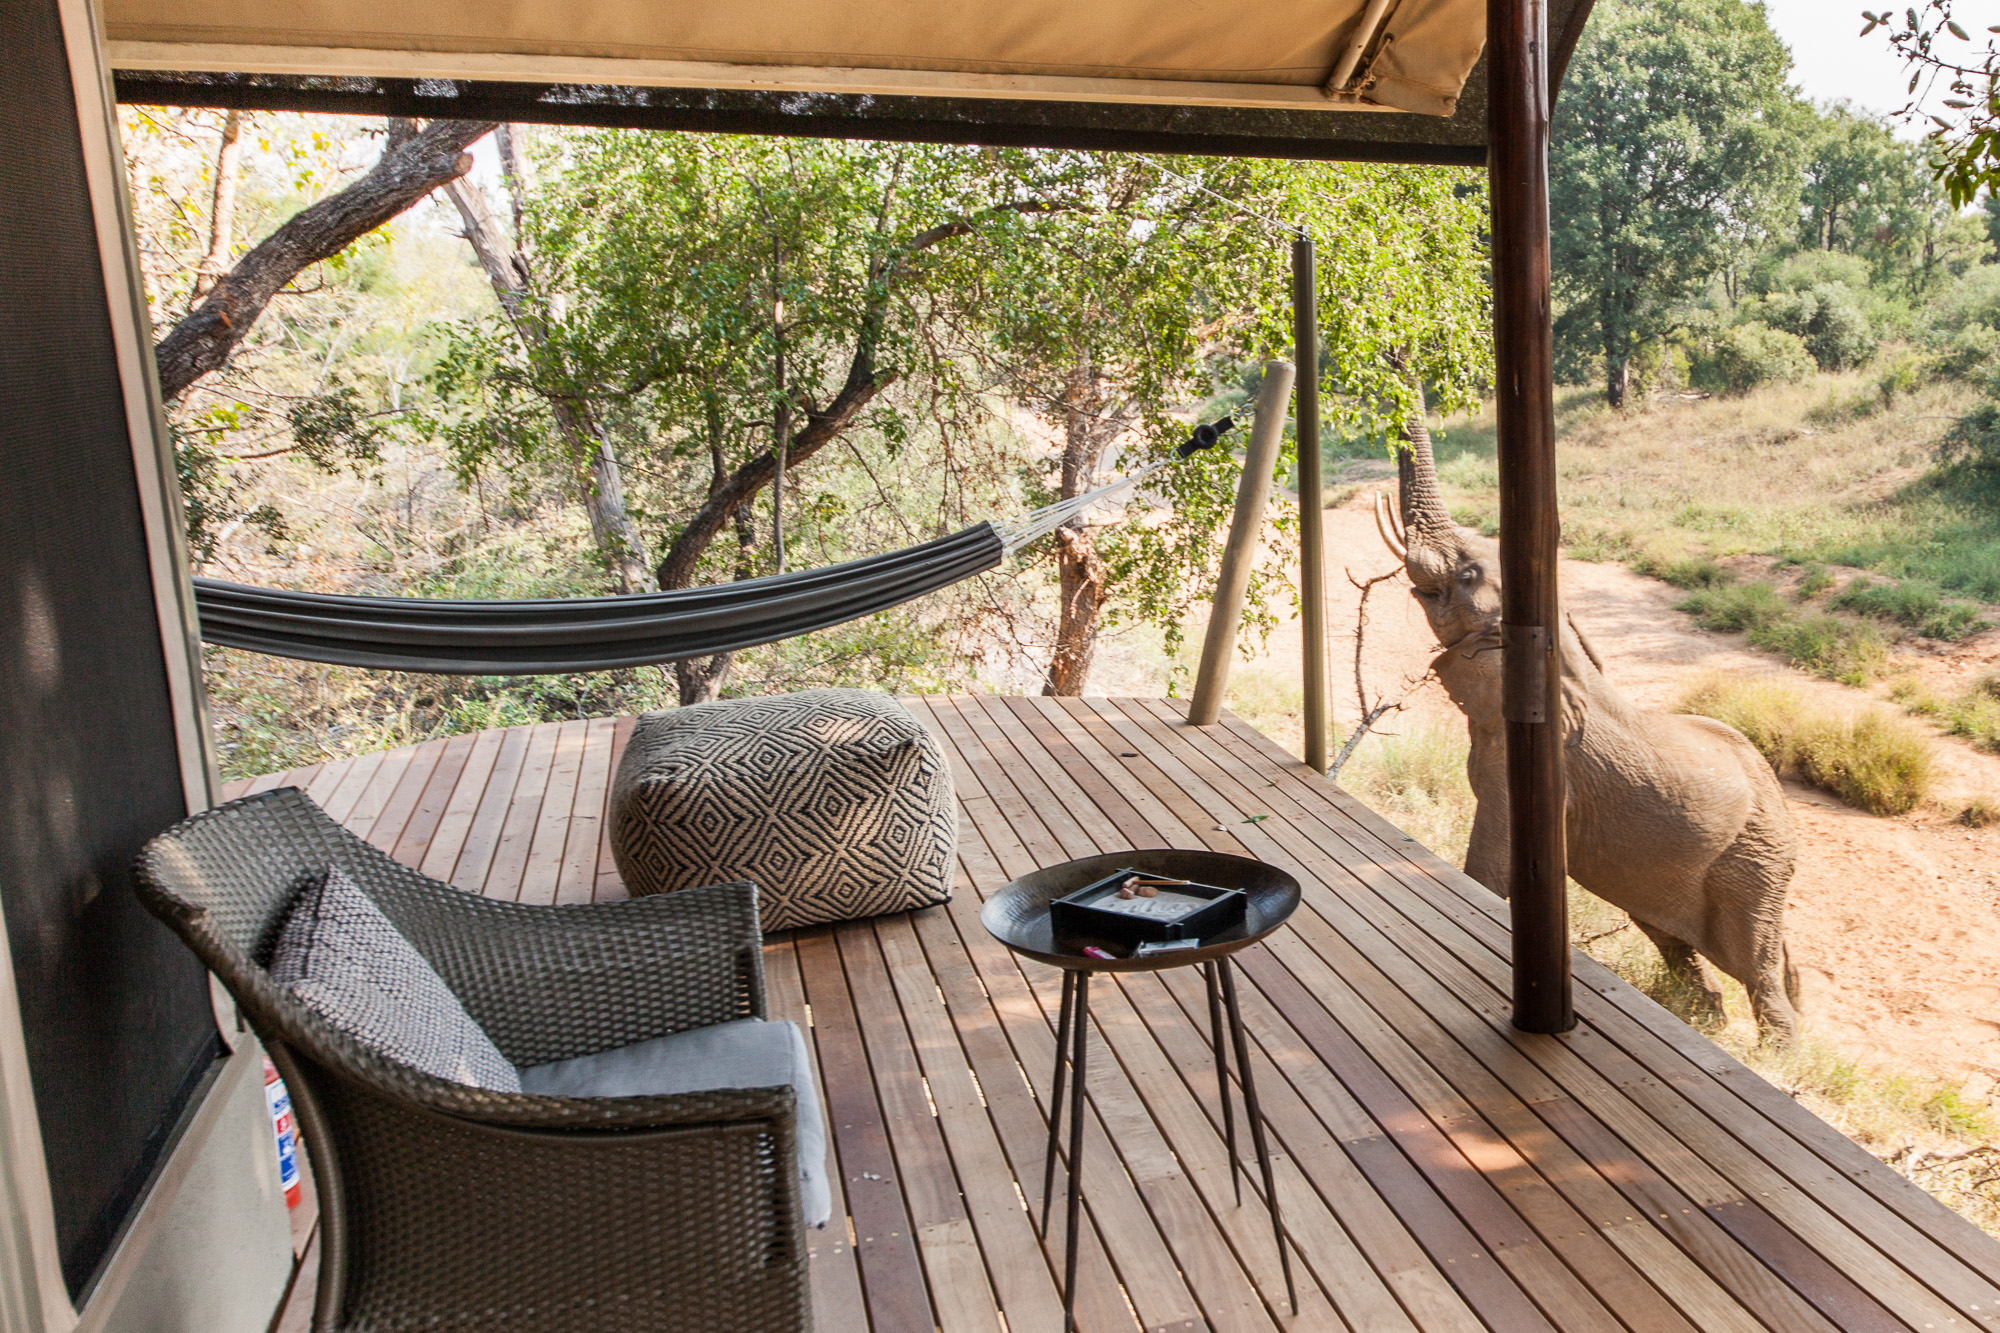 Garonga_accommodationWILDWEB180